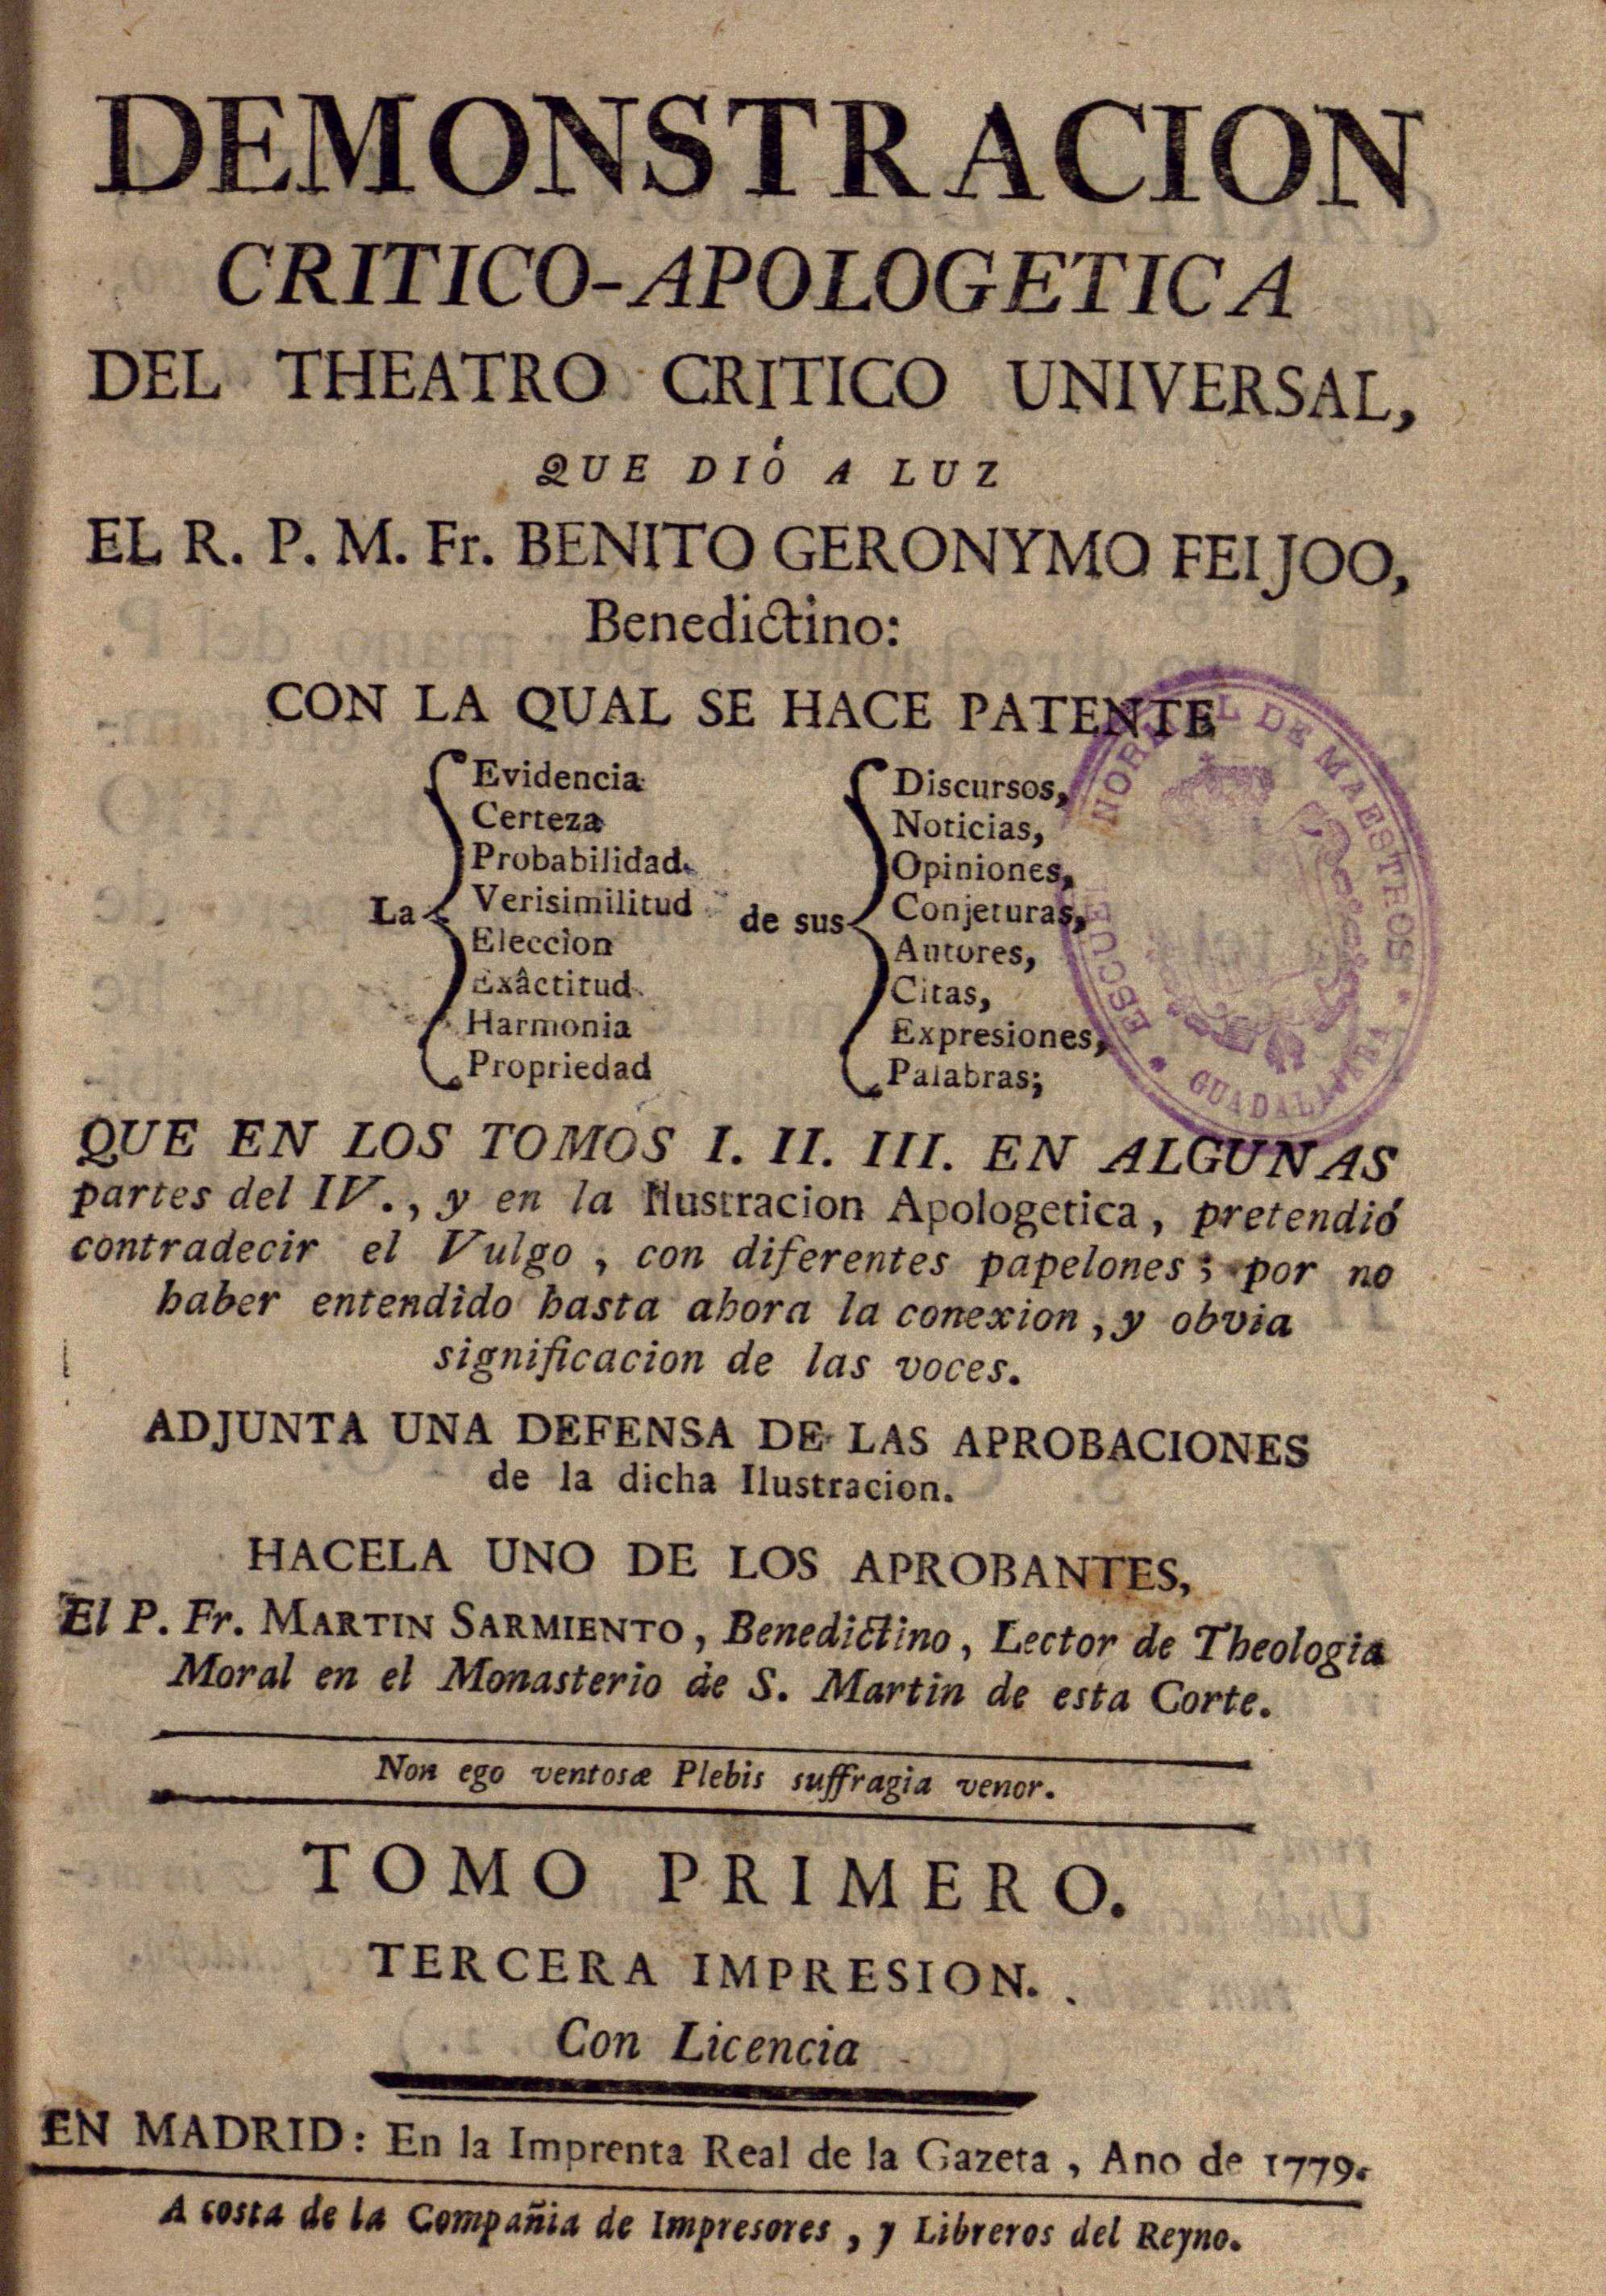 Demostracion critico-apologetica del Theatro Crítico Universal, 1779